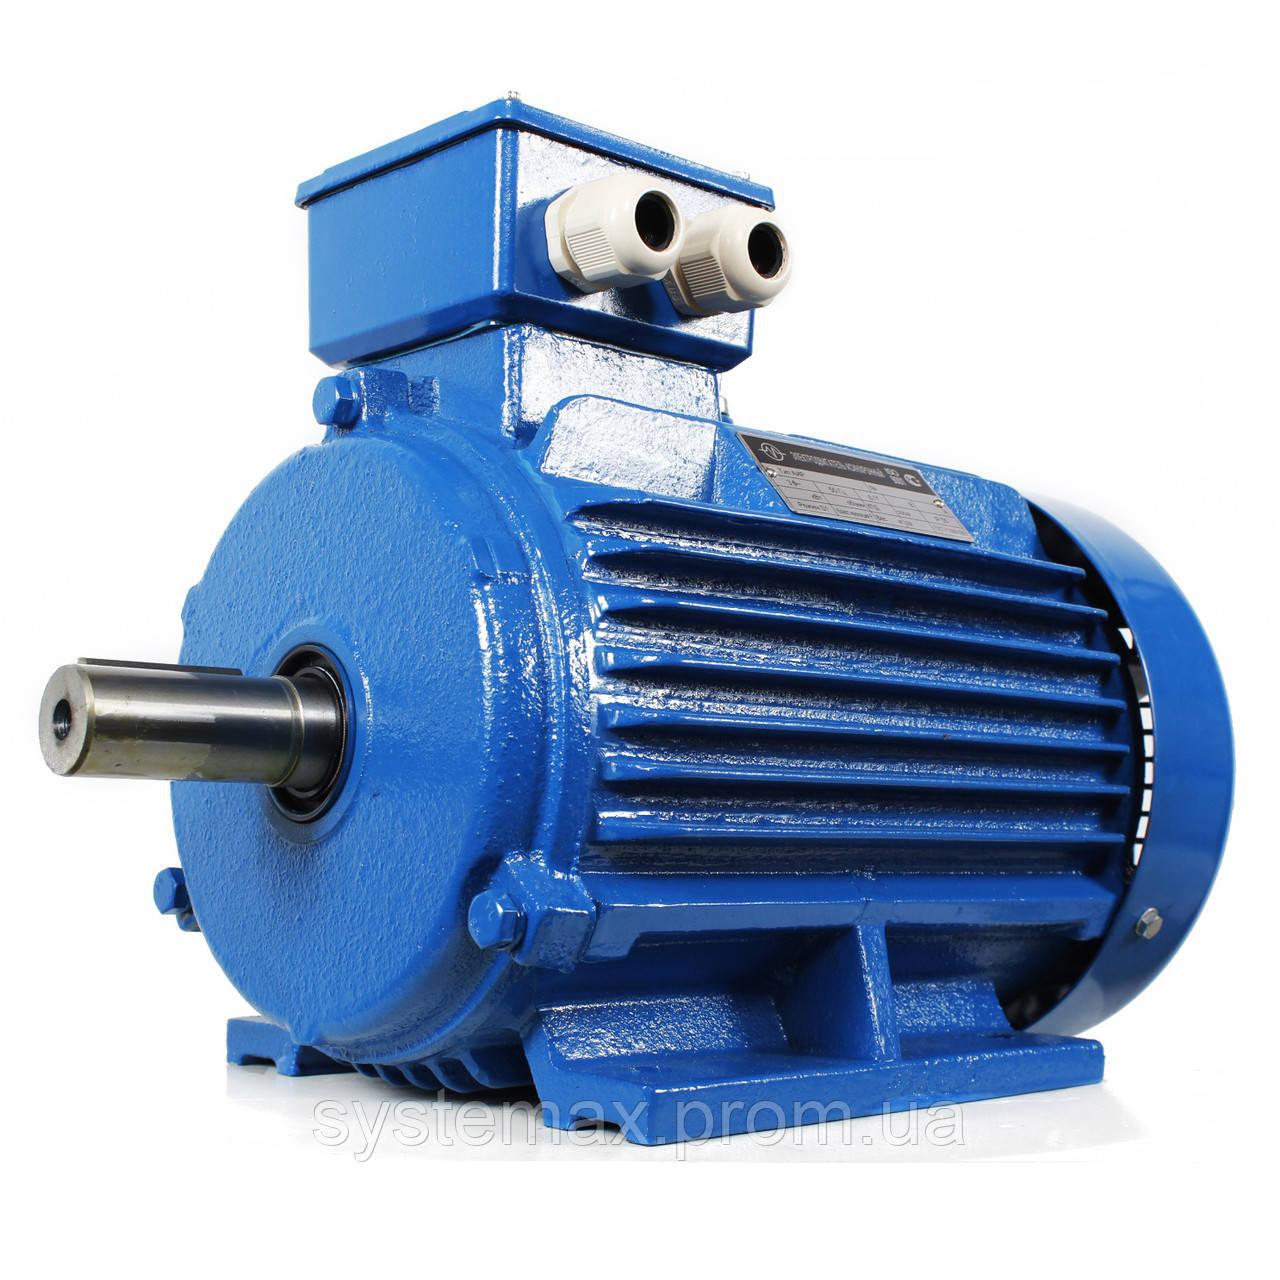 Электродвигатель АИР112МВ8 (АИР 112 МВ8) 3,0 кВт 750 об/мин